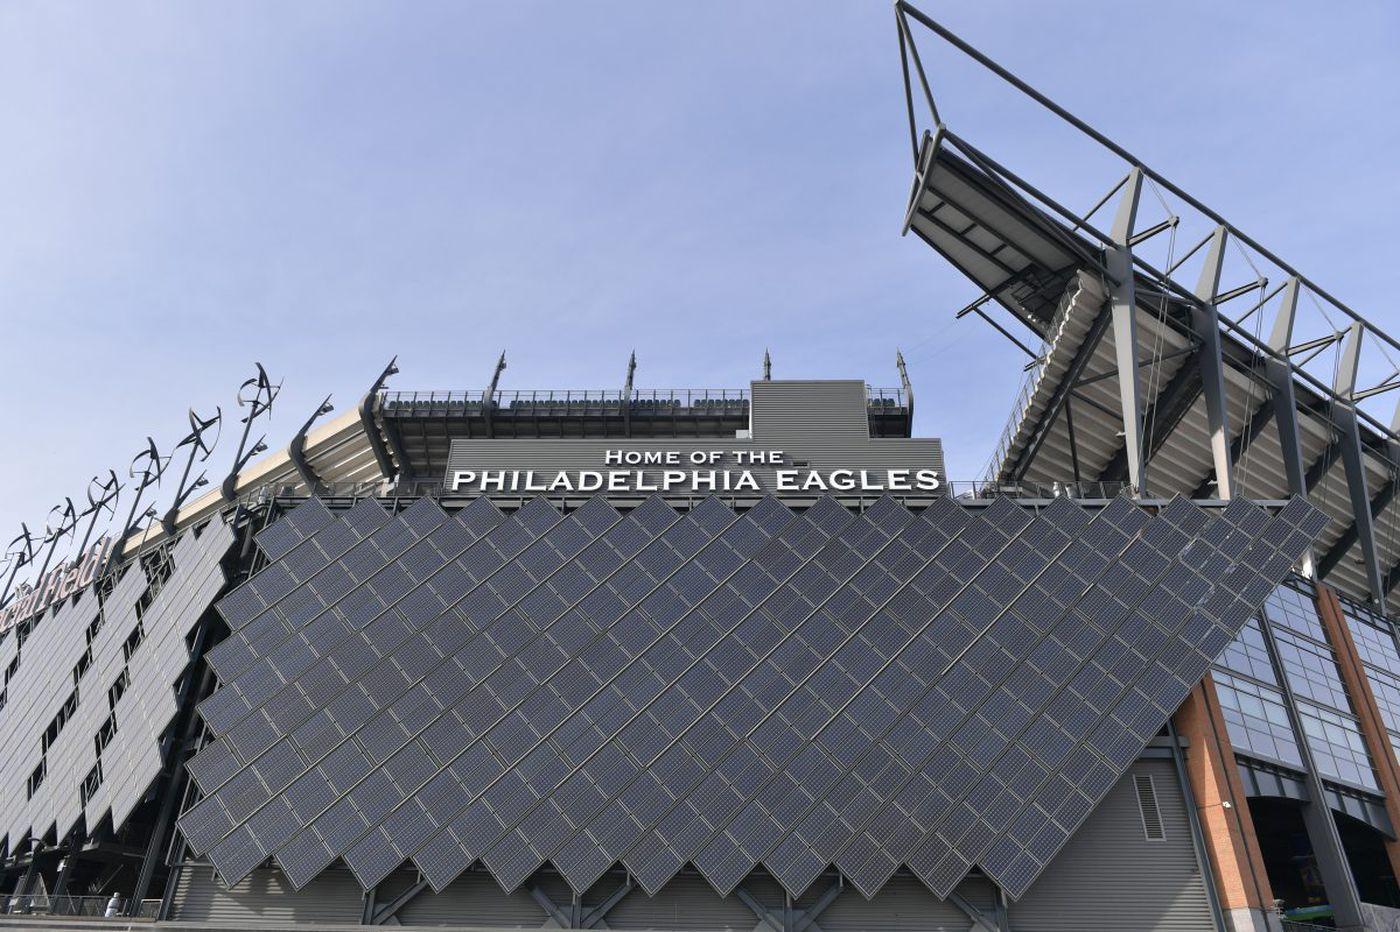 Green smackdown: Lincoln Financial Field vs. U.S. Bank Stadium